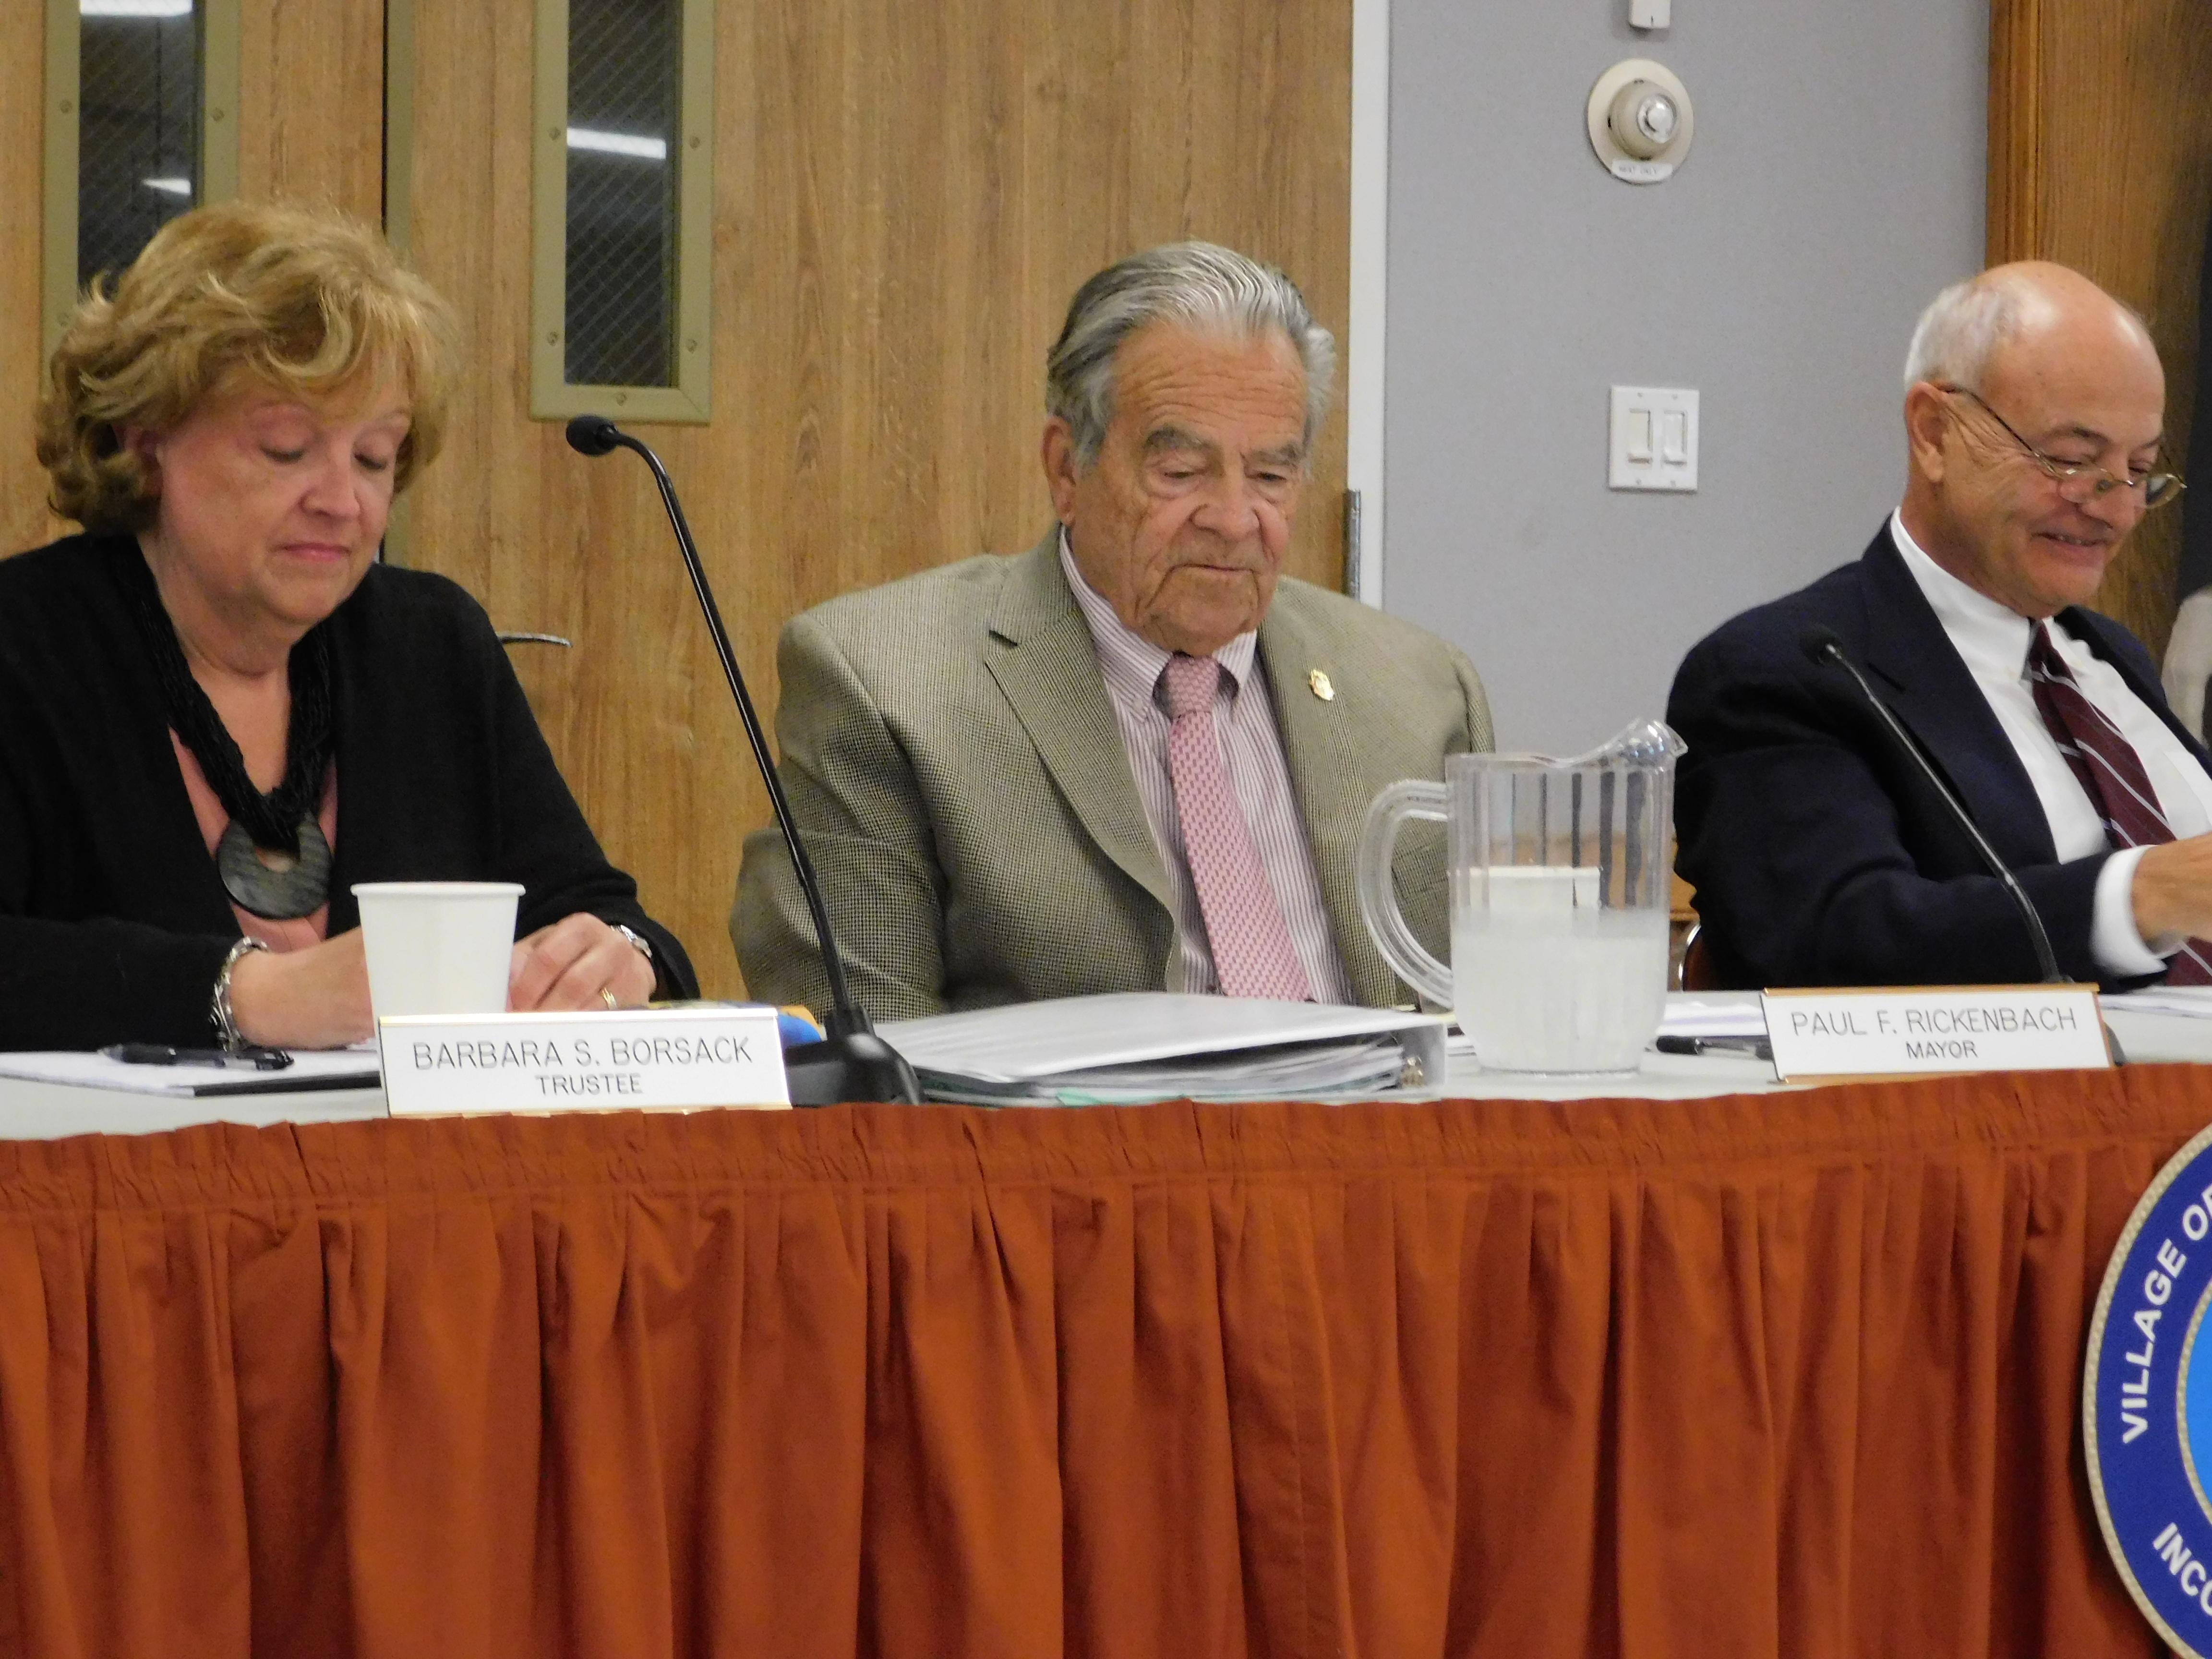 Barbara Borsack, Mayor Paul F. Rickenbach Jr, and Richard Lawler at a recent Village Board meeting. ELIZABETH VESPE